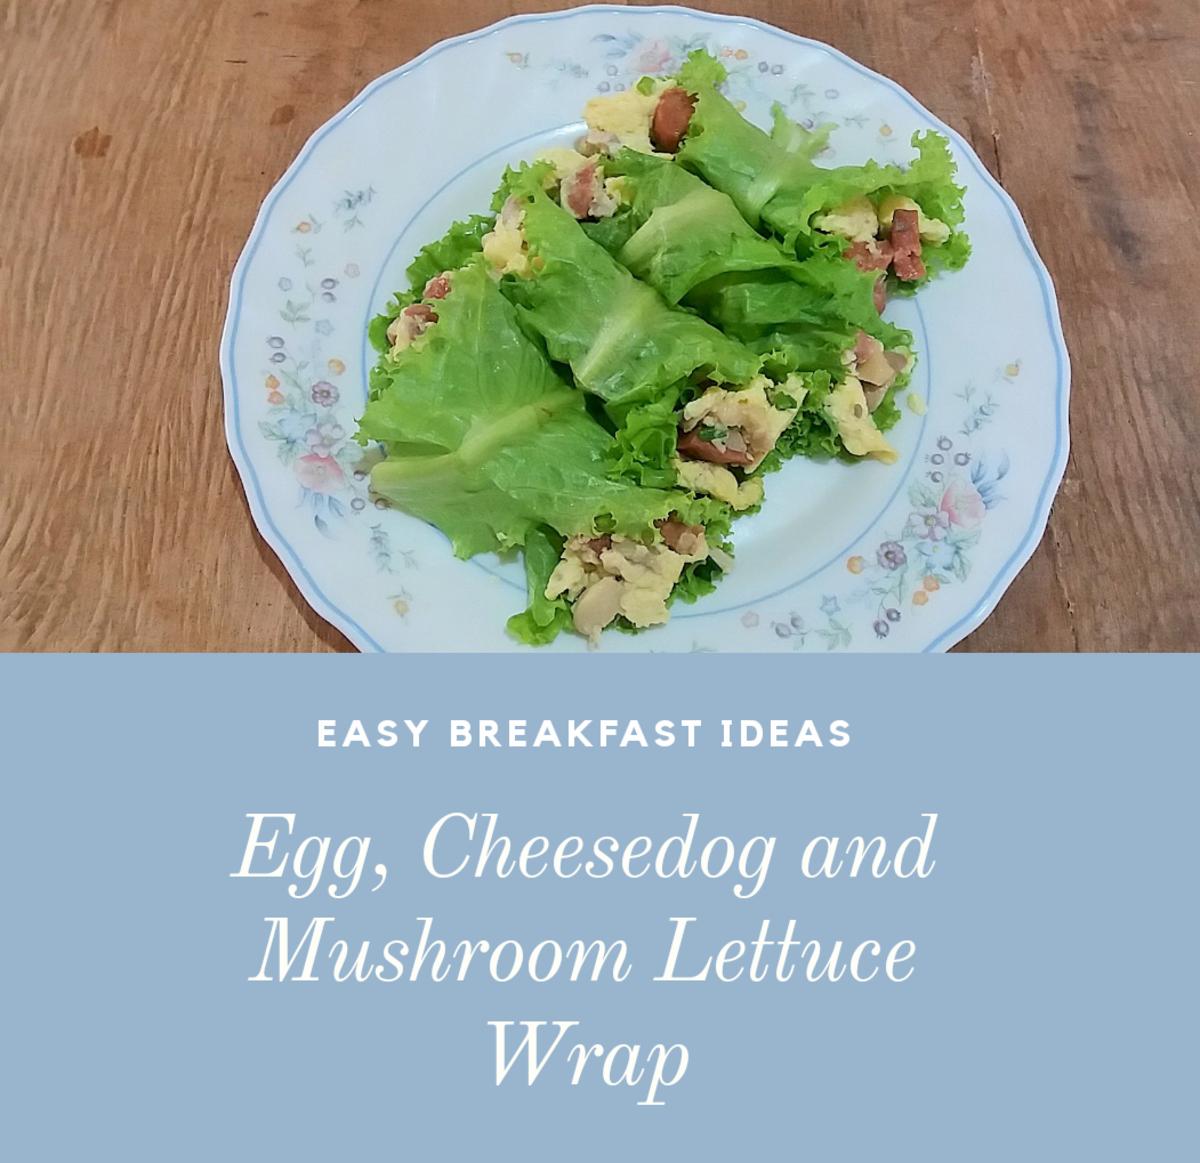 Easy Breakfast Idea: Egg, Cheese Dog, and Mushroom Lettuce Wrap